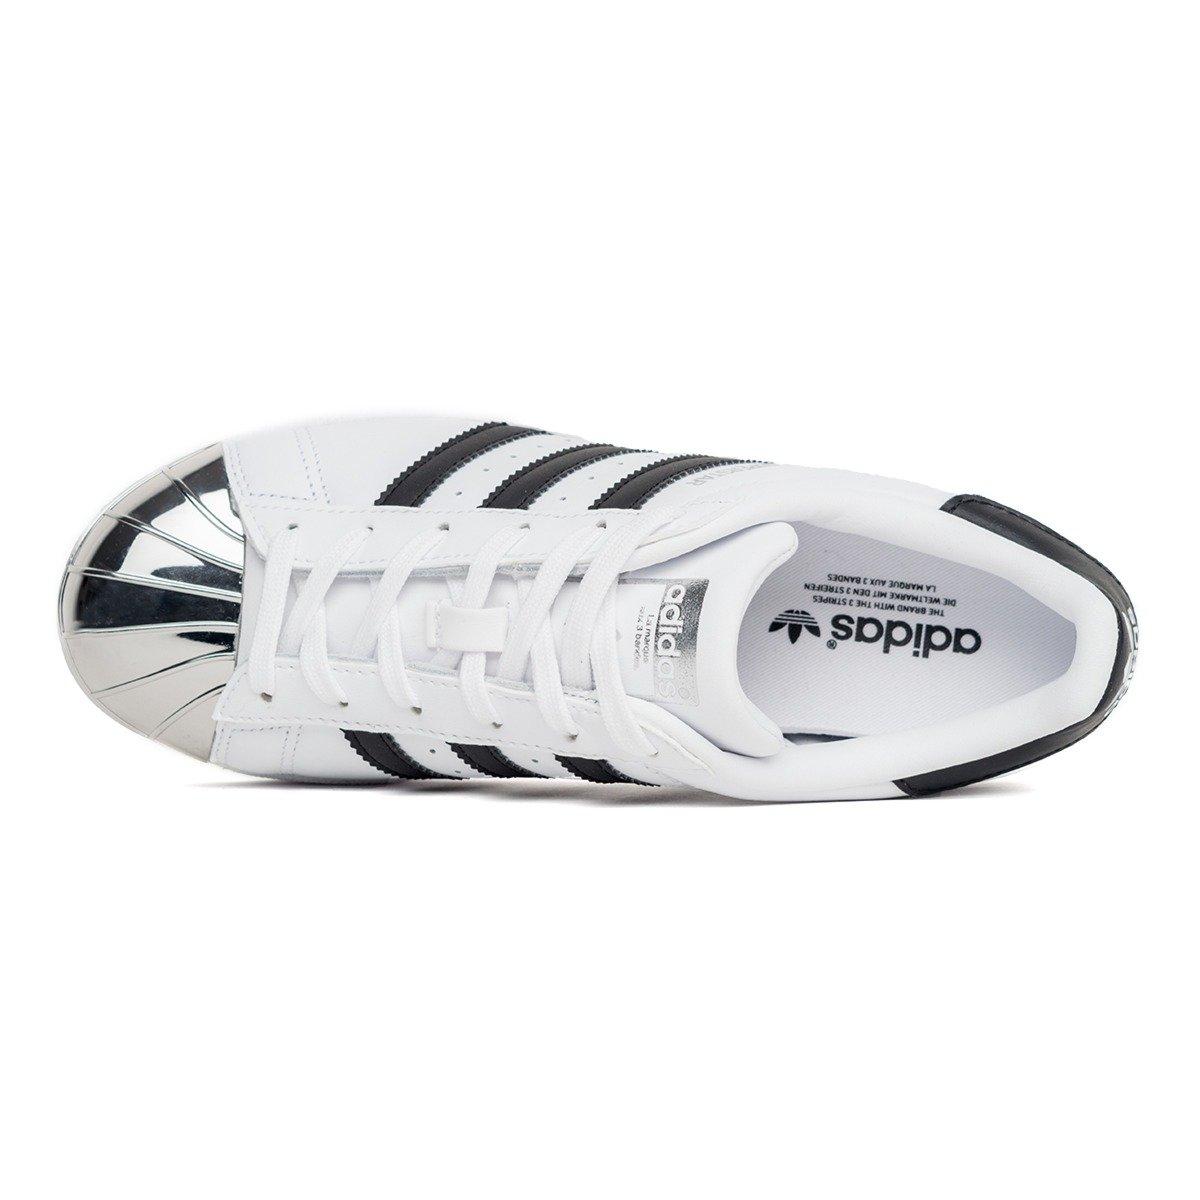 adidas metal toe white